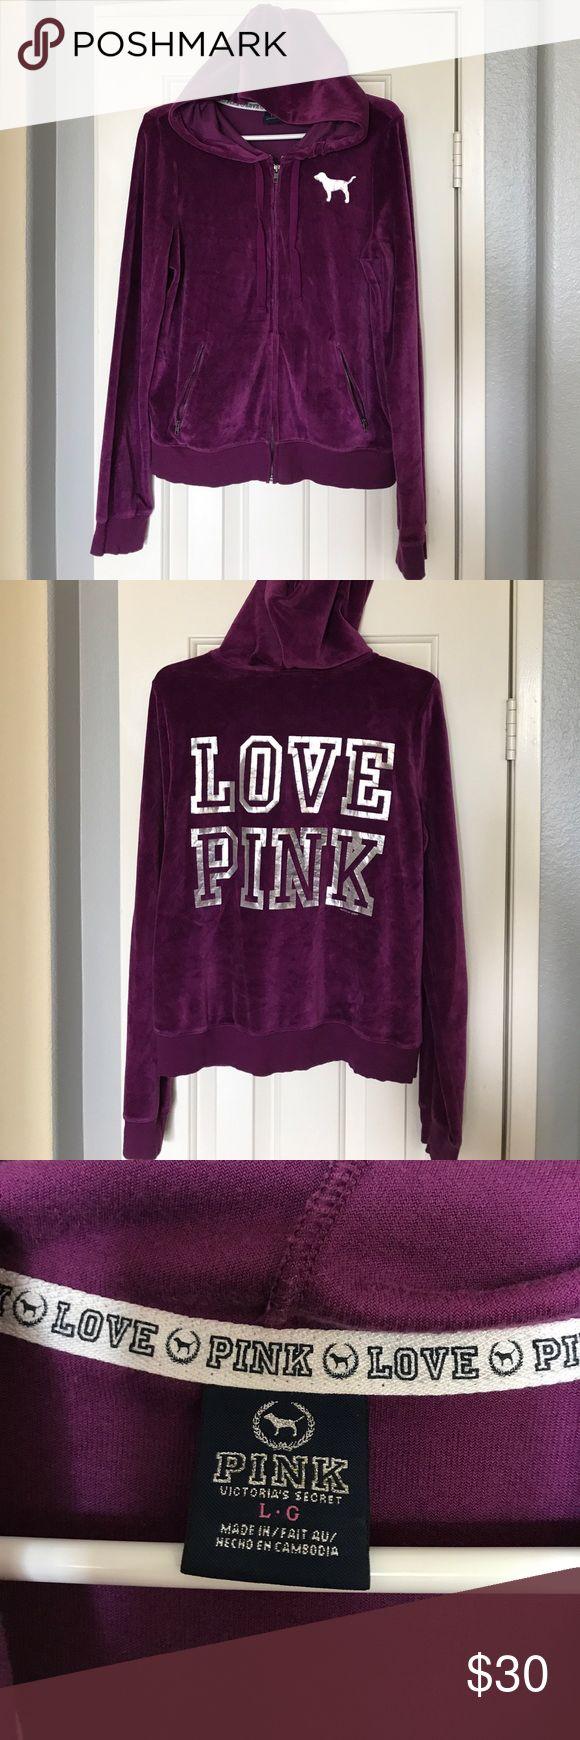 "VS PINK zip up jacket Victoria's Secret PINK, purple, zip up jacket with hood & front pockets. PINK dog logo on front left chest & ""LOVE PINK"" on the back. Good condition! PINK Victoria's Secret Other"